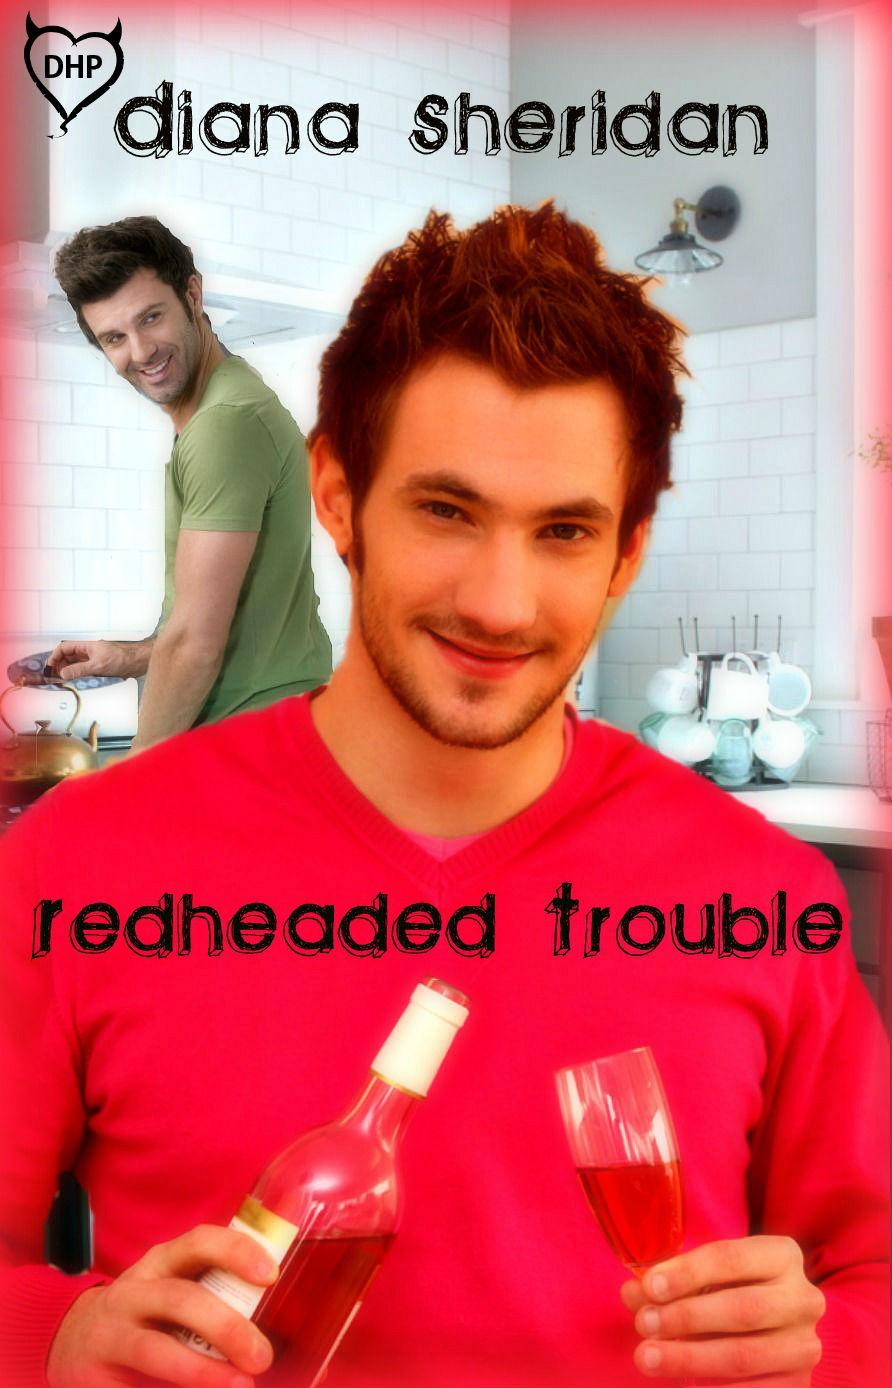 REDHEADED TROUBLE - Diana Sheridan